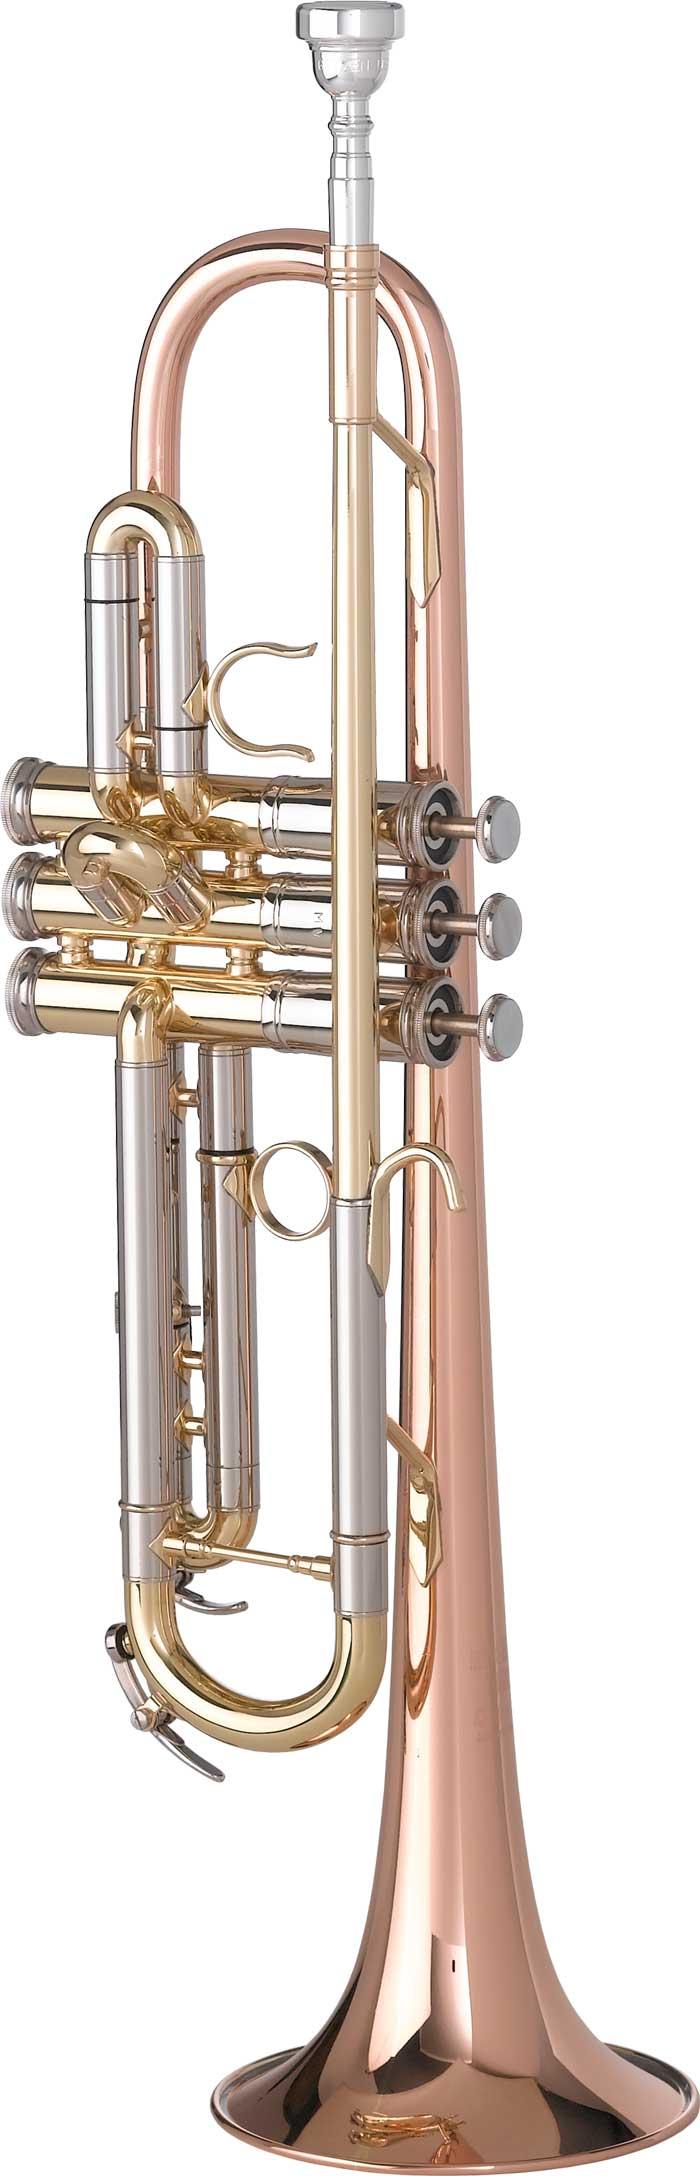 "3001MV ""Mike Vax"" Artist Model Bb Trumpet"